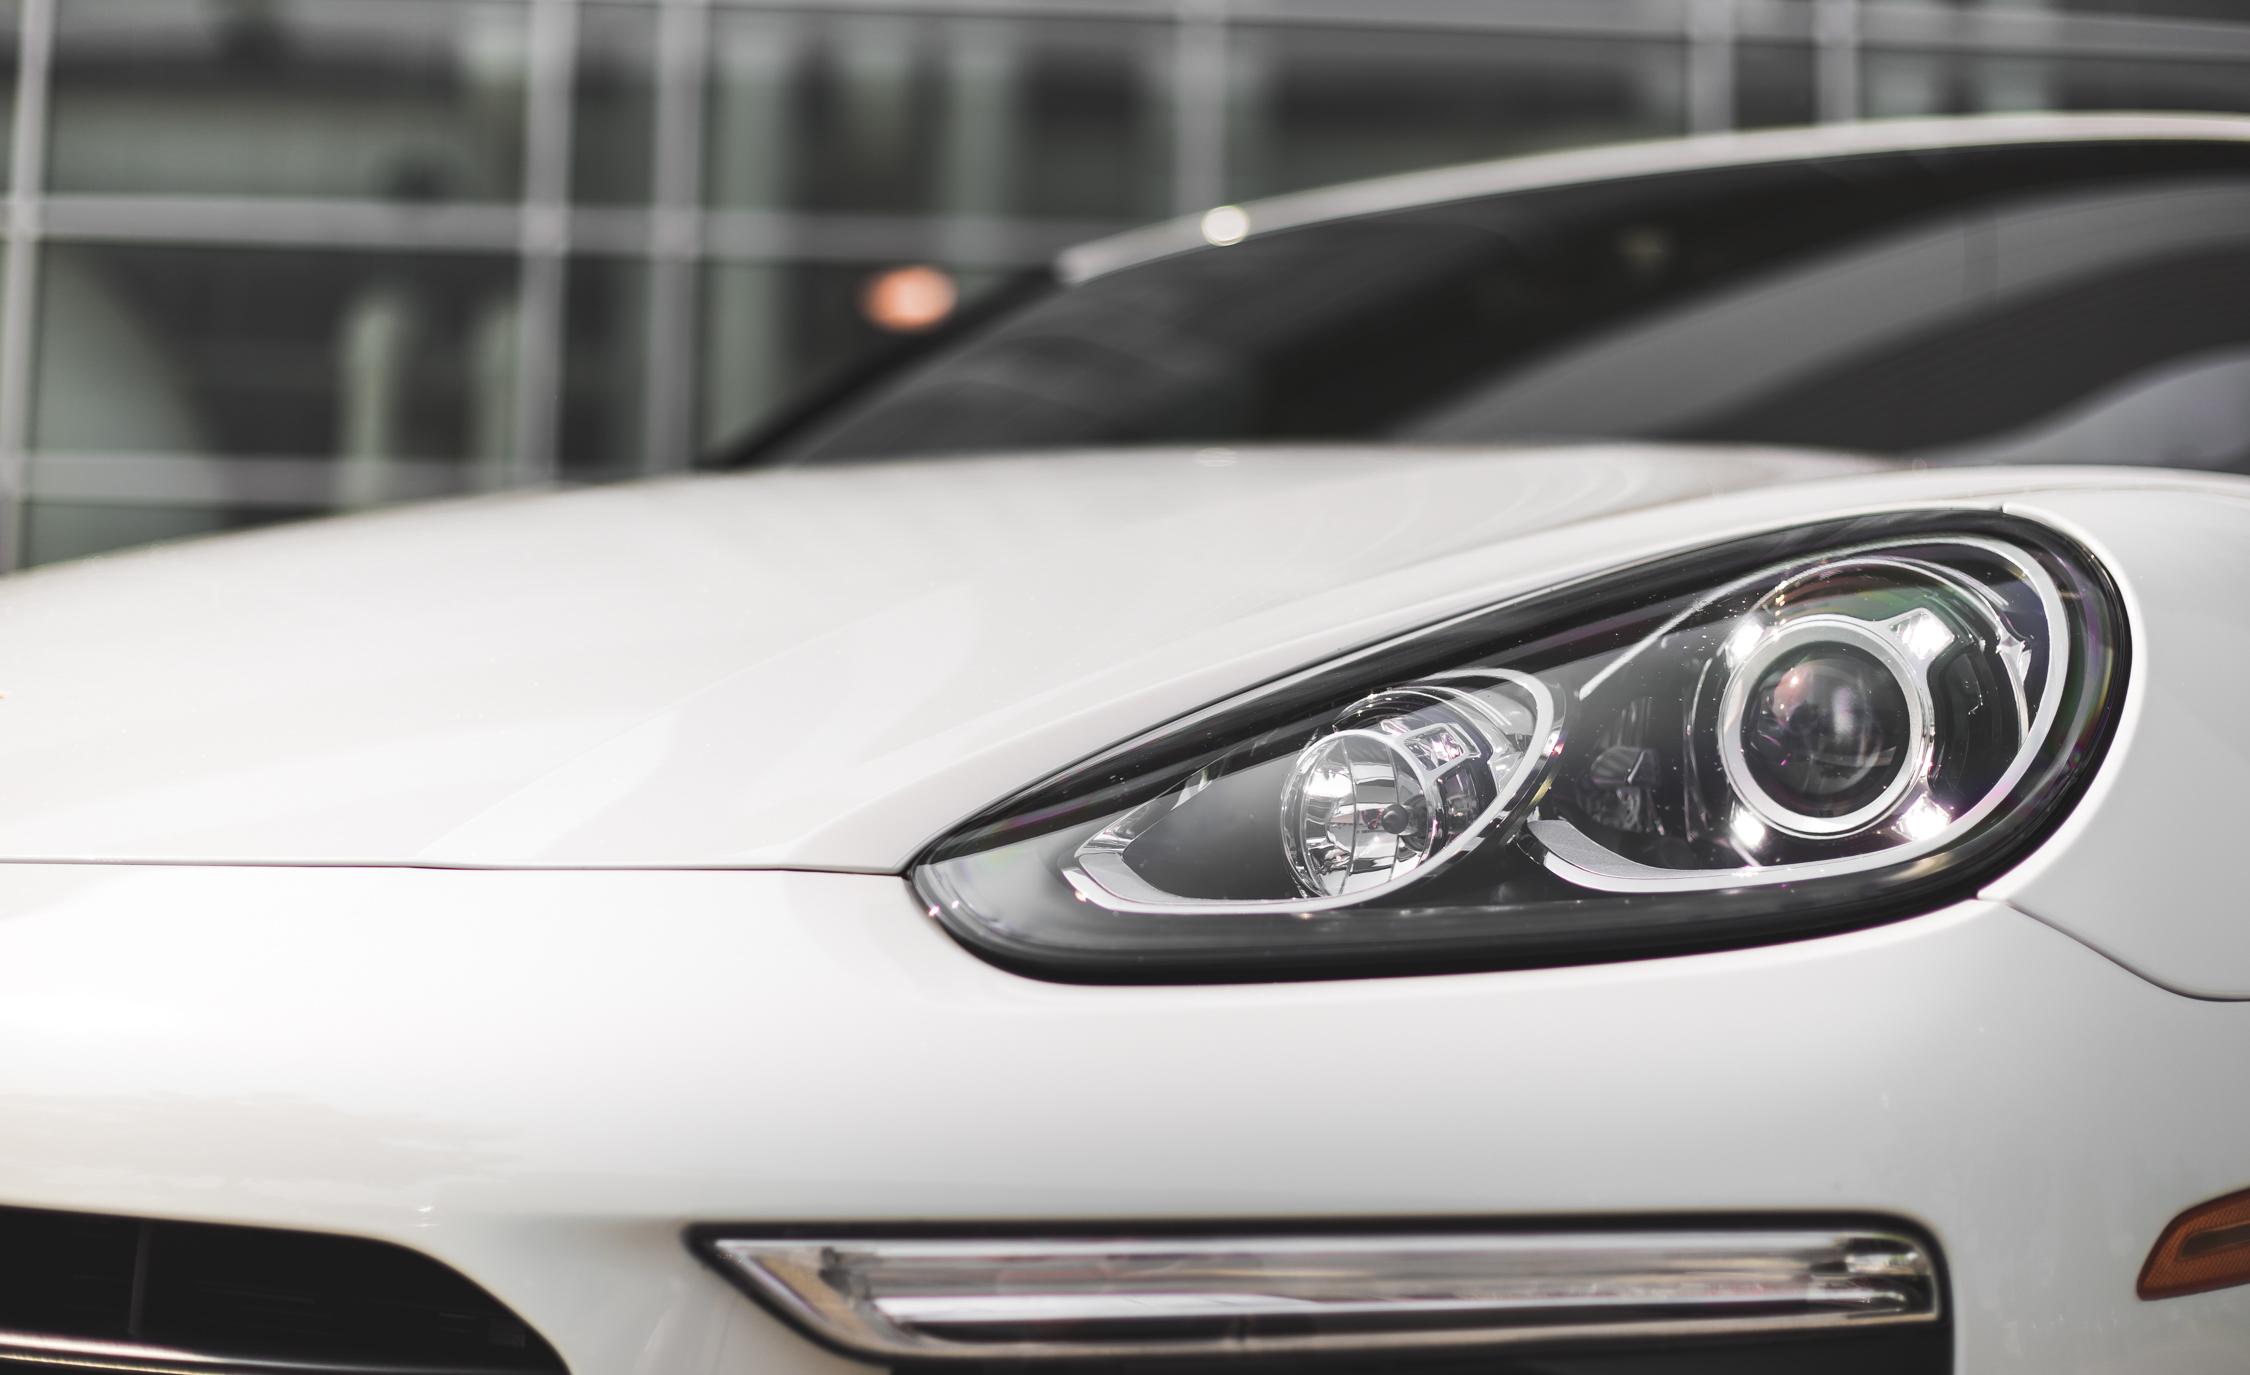 2015 Porsche Cayenne S E-Hybrid Exterior Left Headlamp